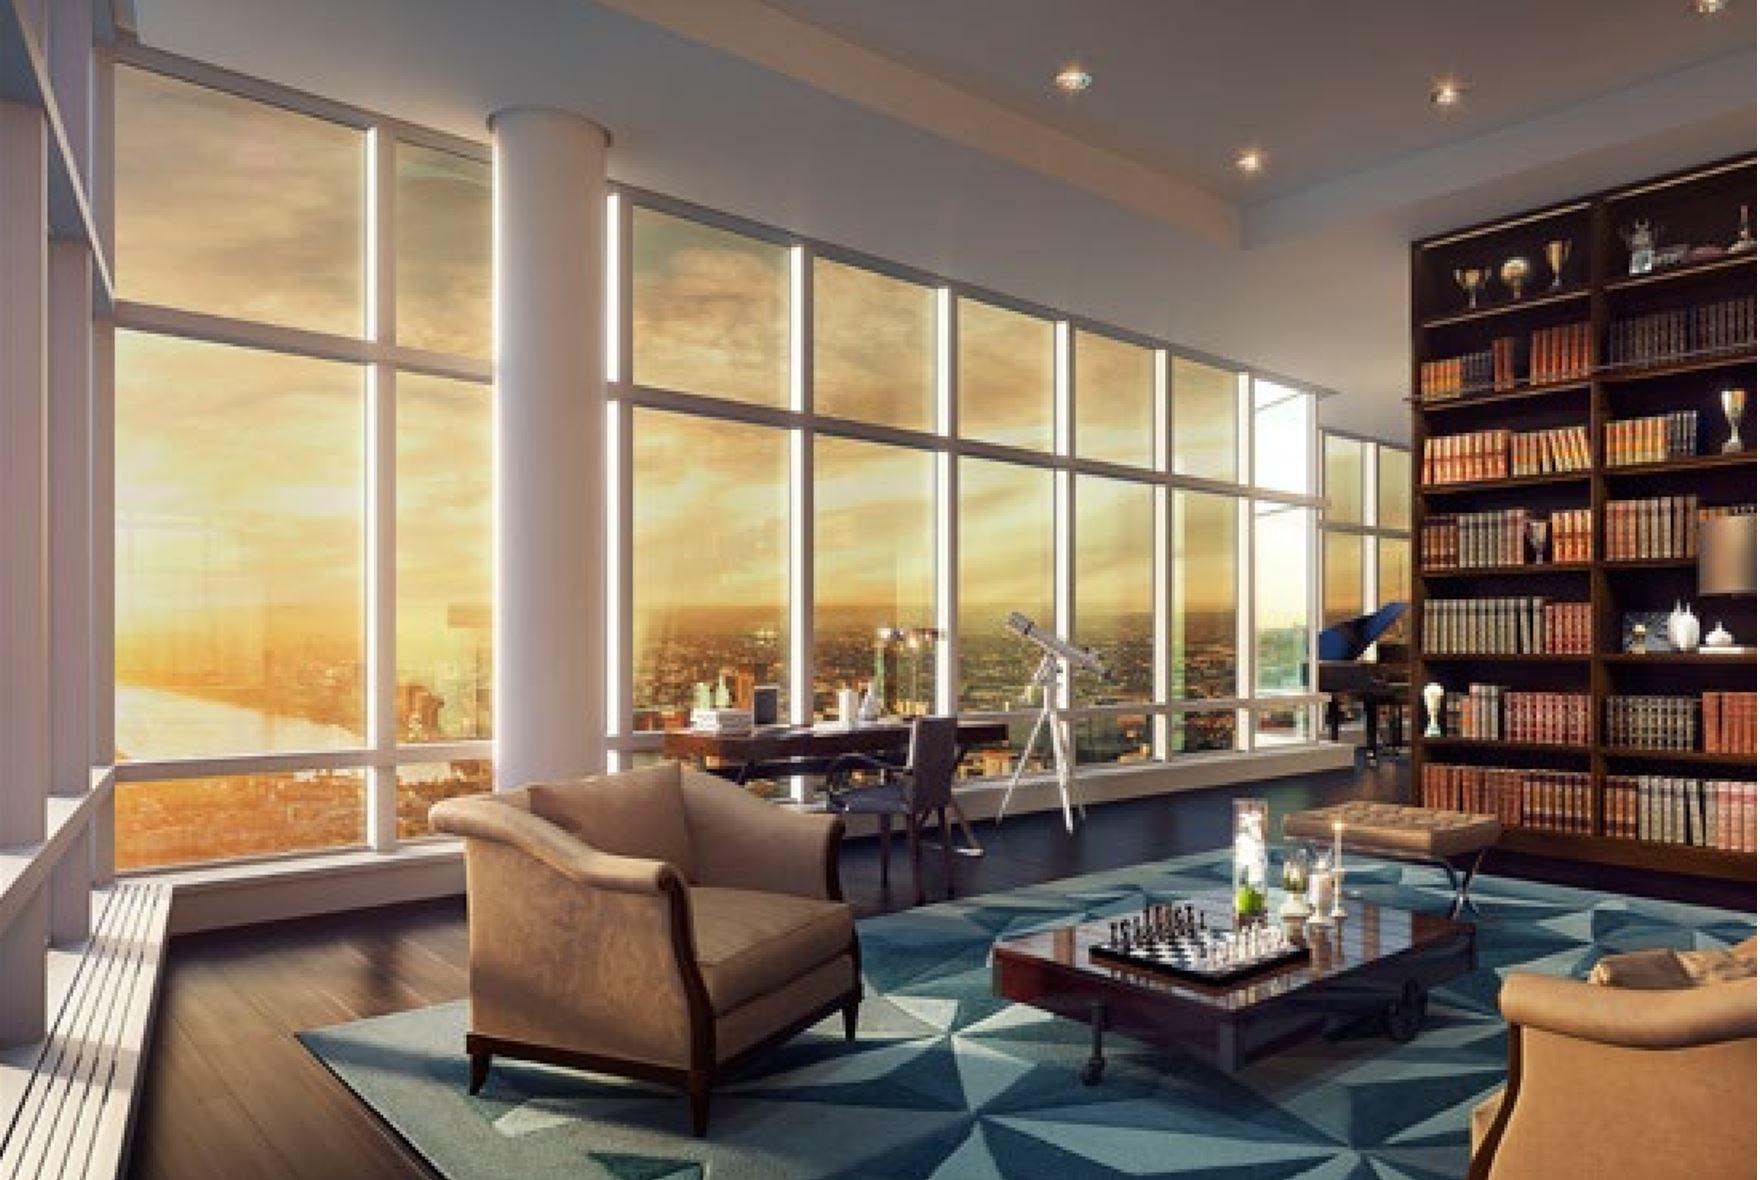 Boston to invest Boston Palace Magazine